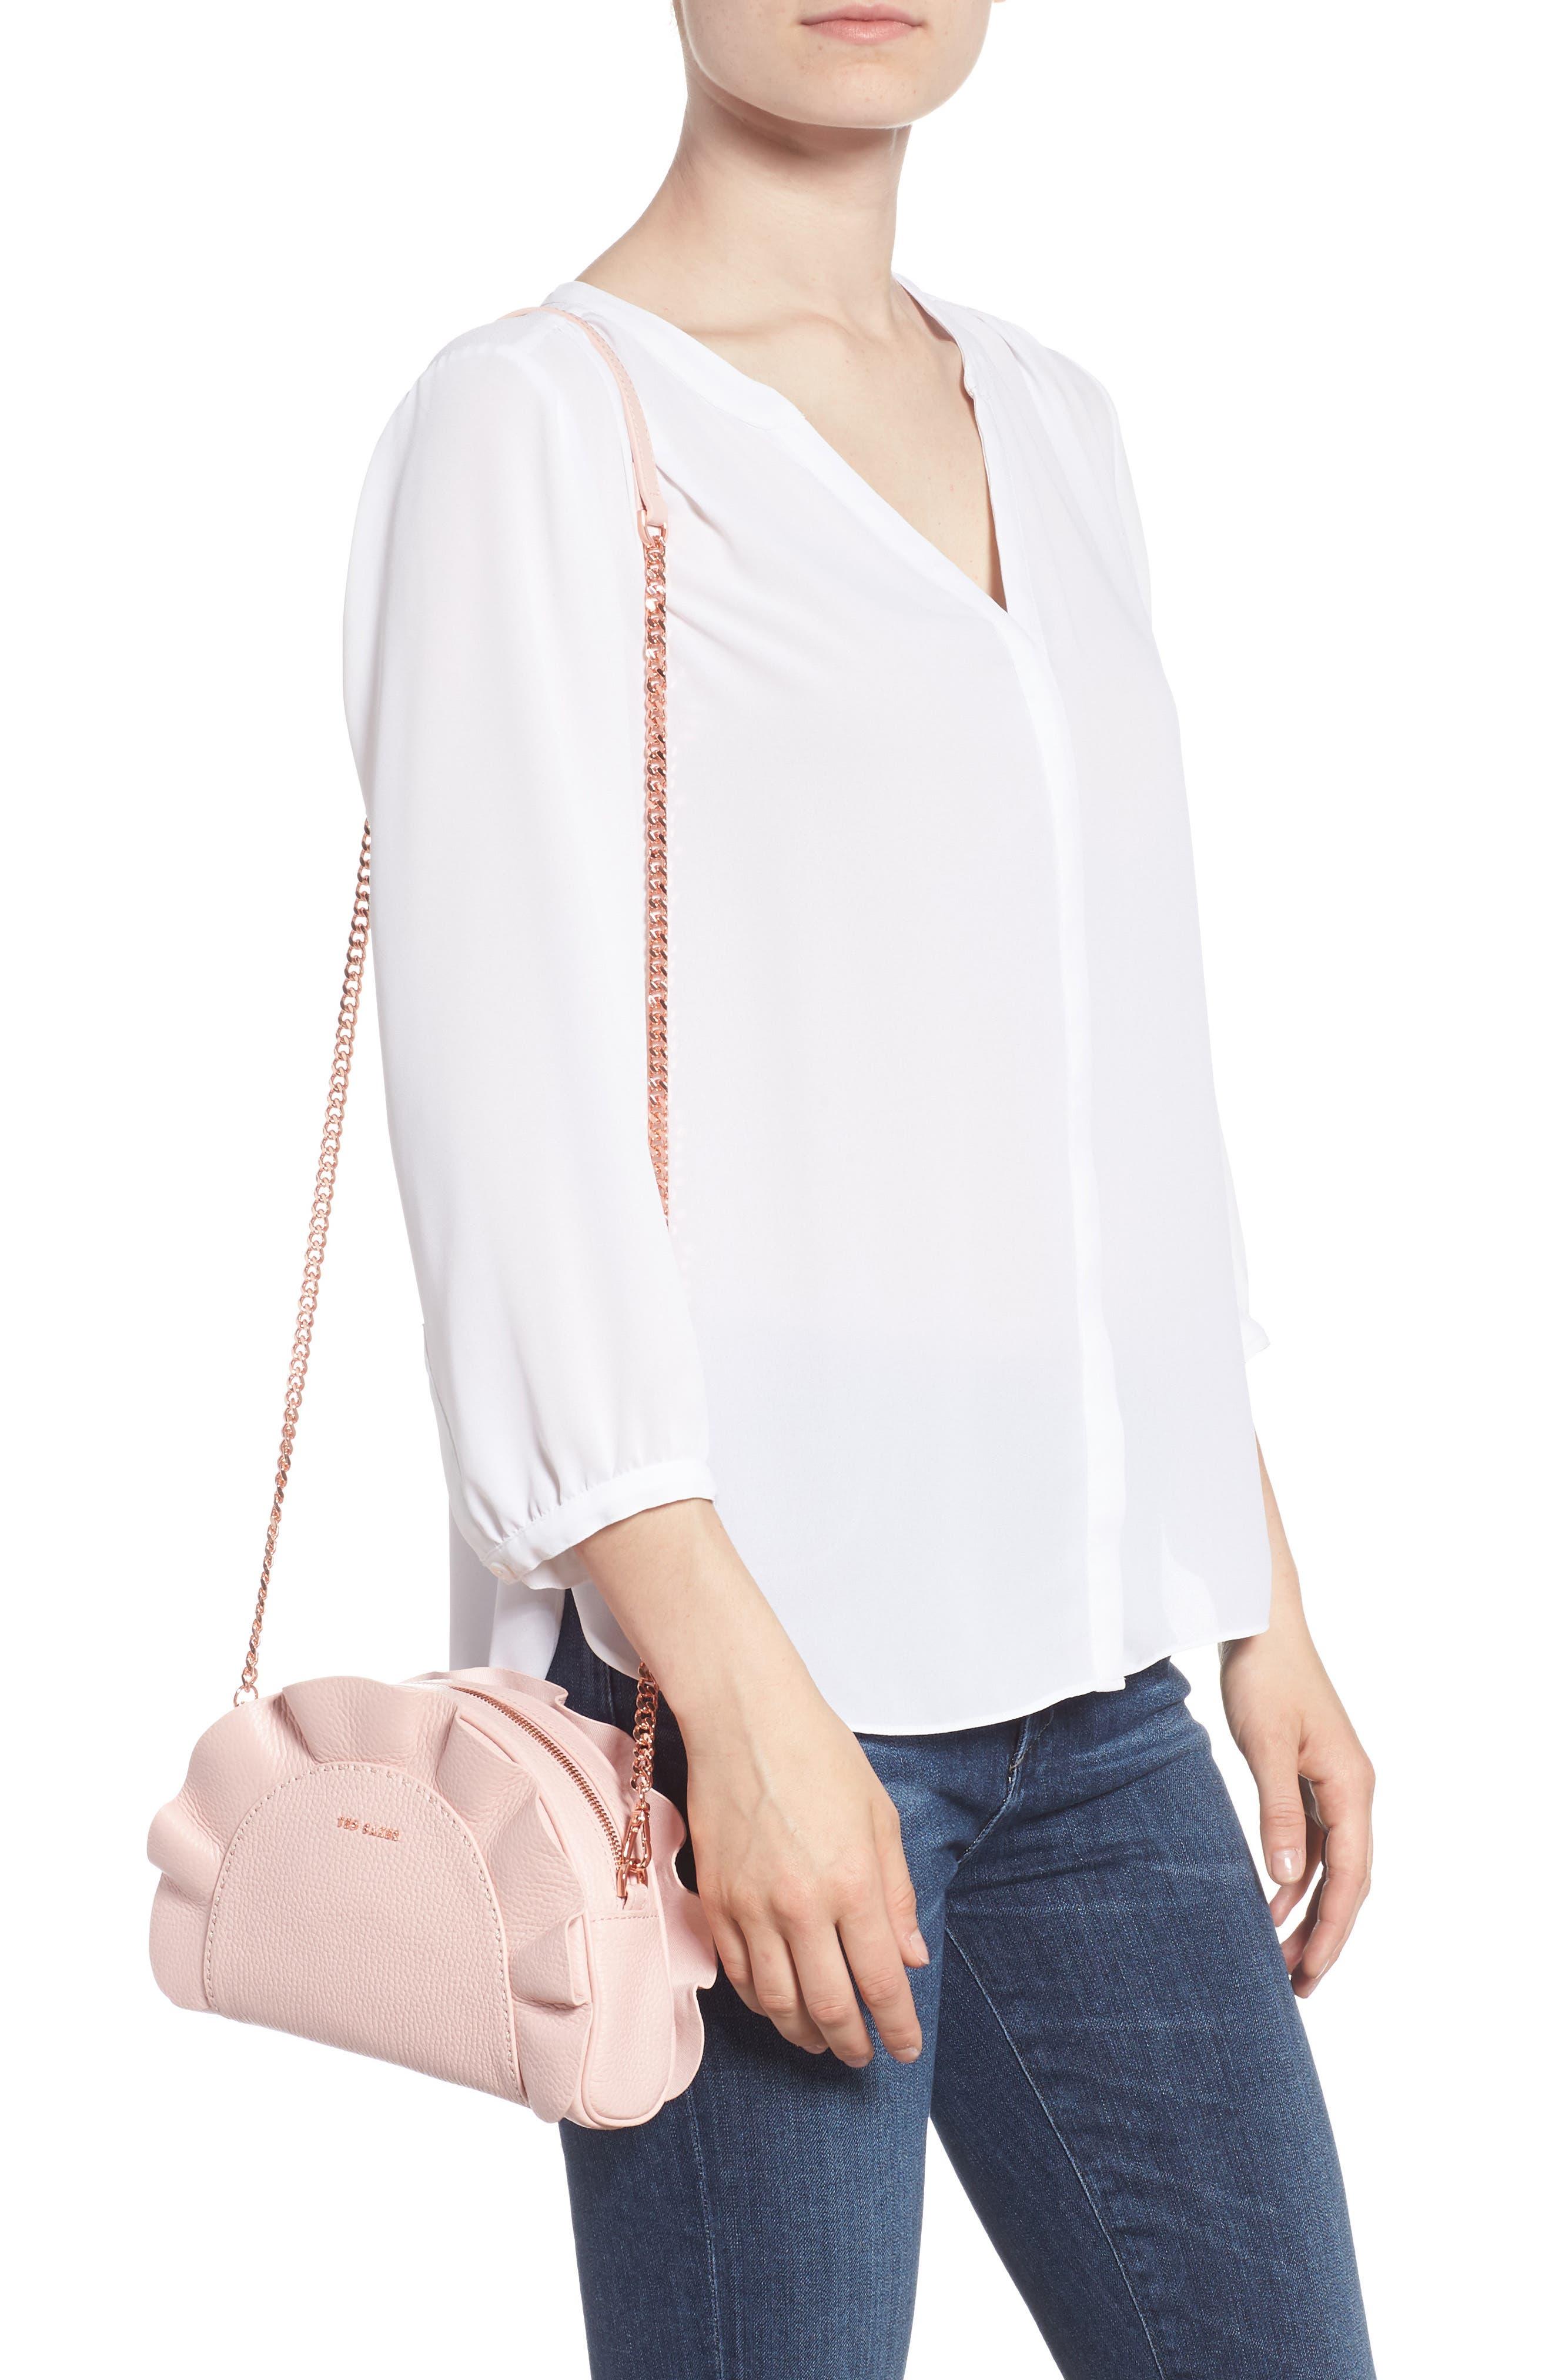 Ruffle Half Moon Leather Crossbody Bag,                             Alternate thumbnail 2, color,                             Light Pink